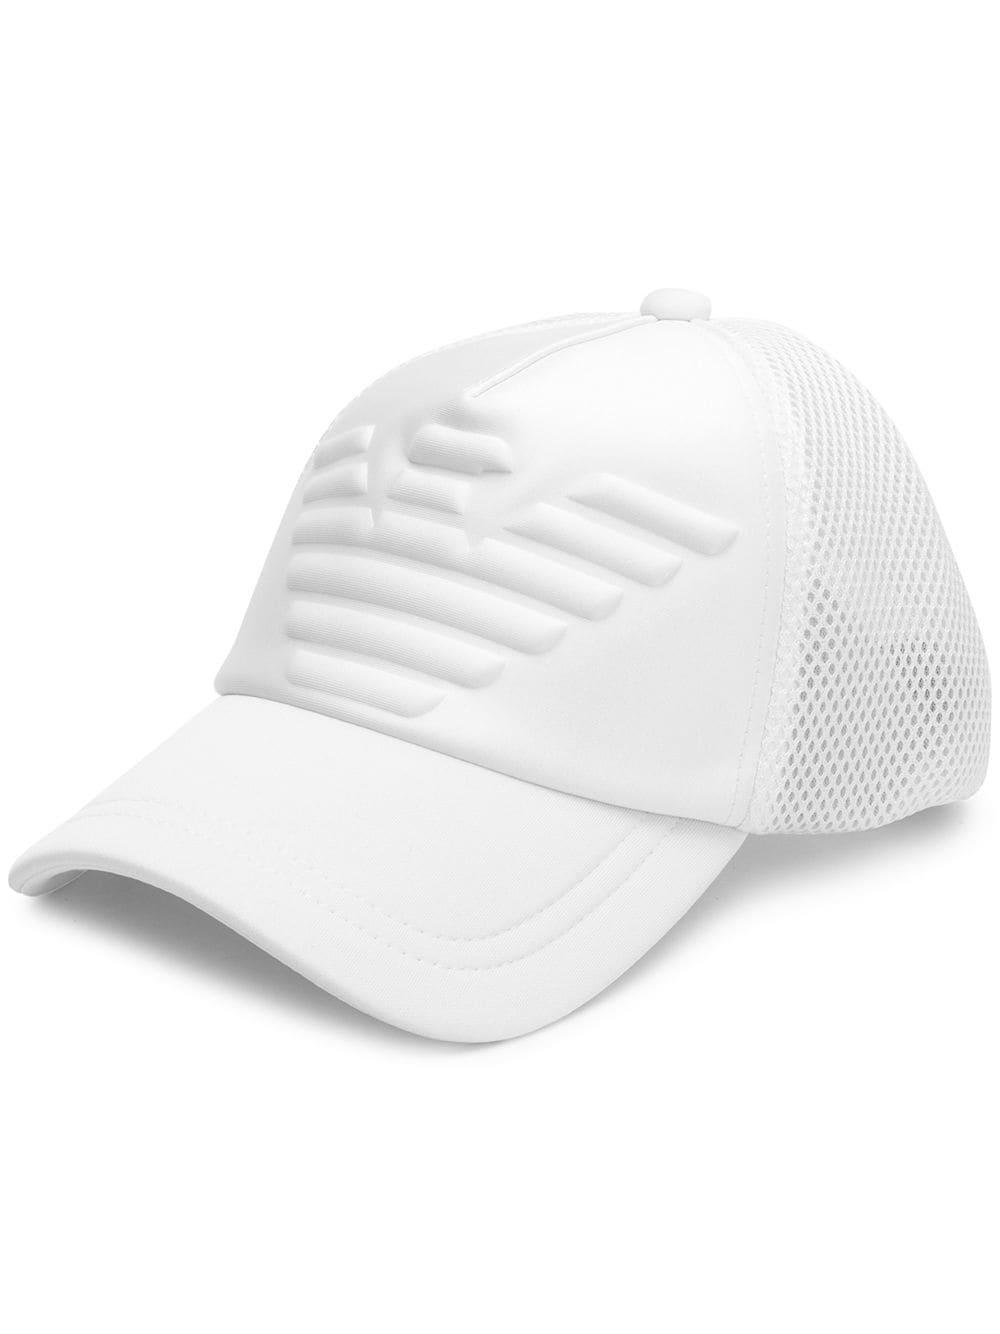 1e7bf11b2c843 Emporio Armani Logo Hat - White